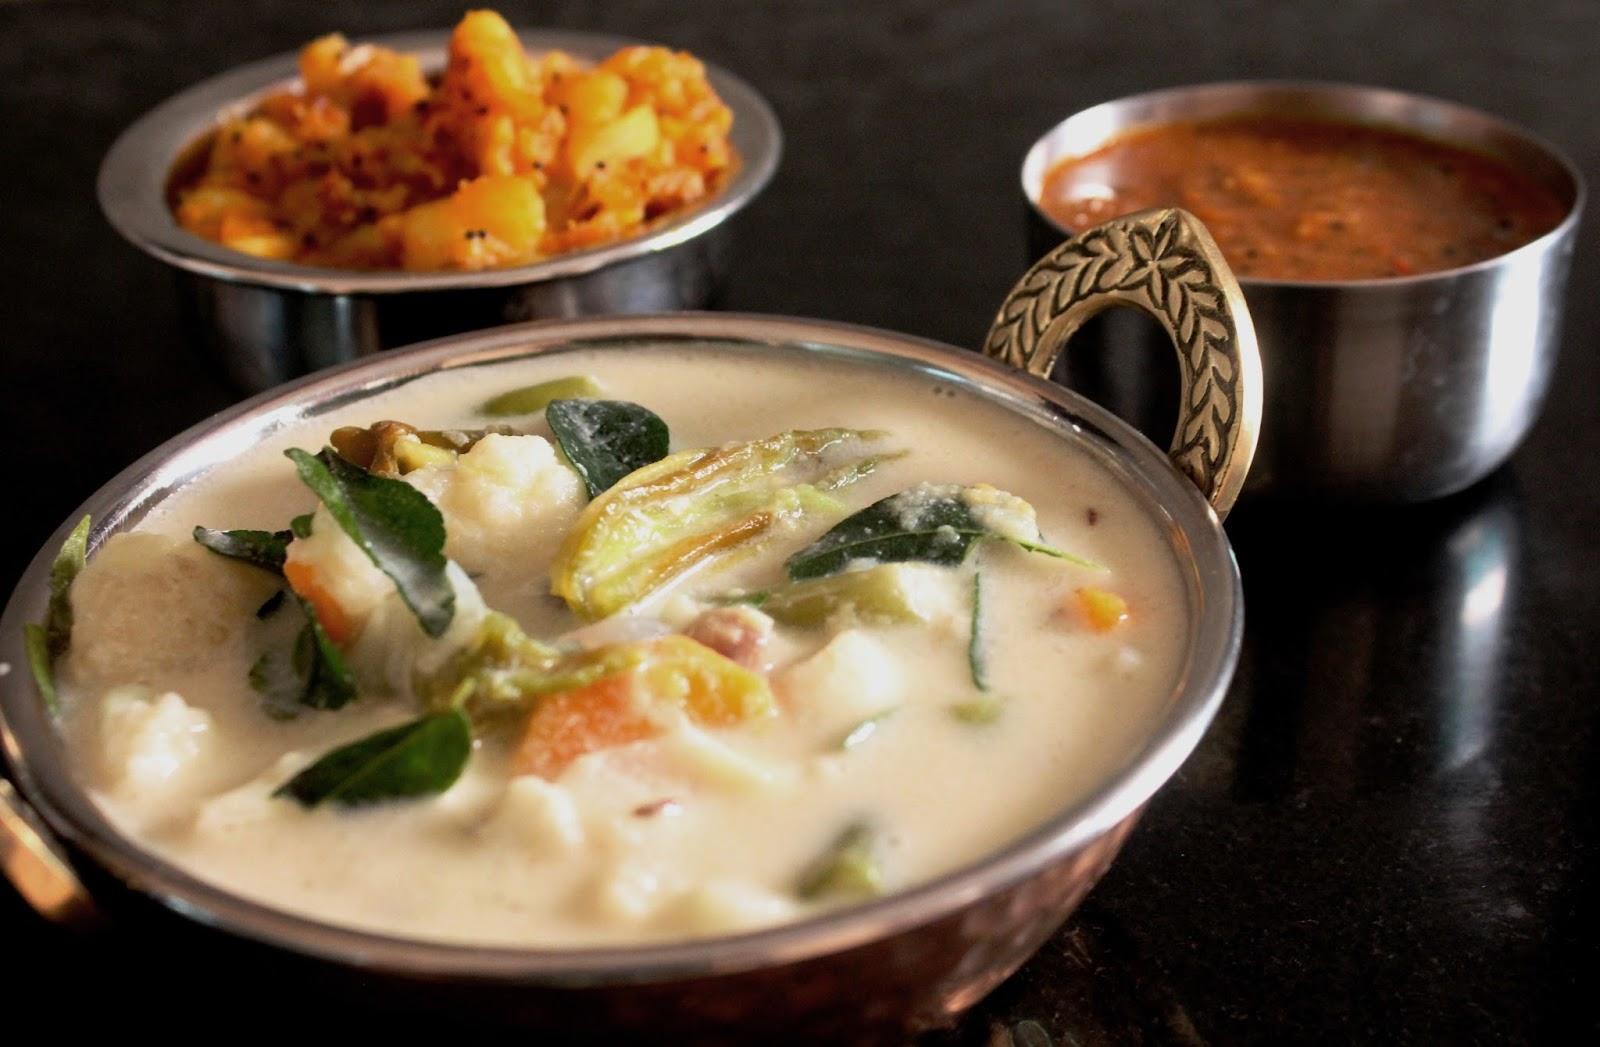 Tirunelveli Sodhi Kuzhambu (Cream of Coconut Milk with Vegetables) -  Bhojana Recipes